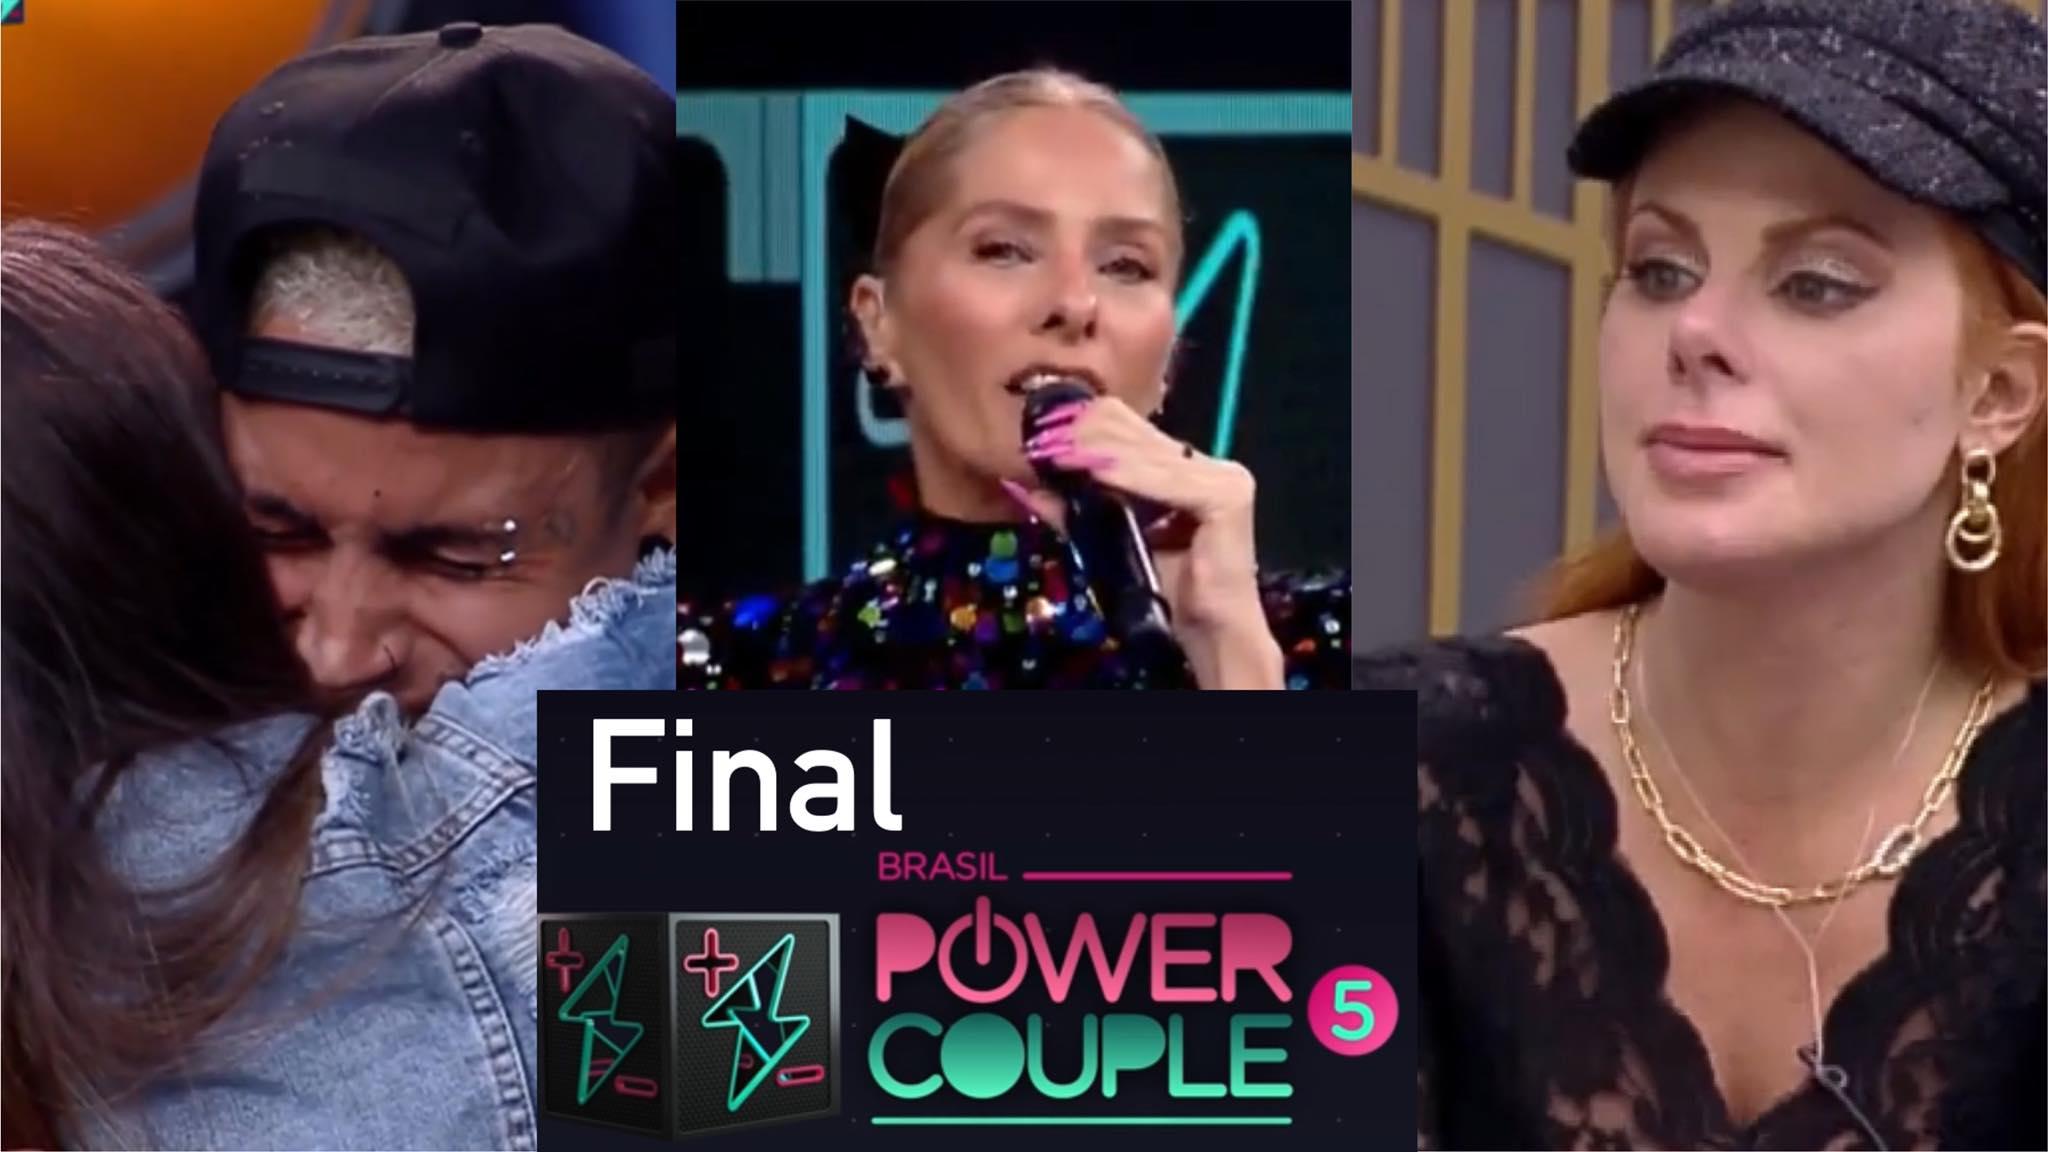 Adriane Galisteu anuncia grandes surpresas na final do Power Couple. Fonte: Montagem/Fashion Bubbles